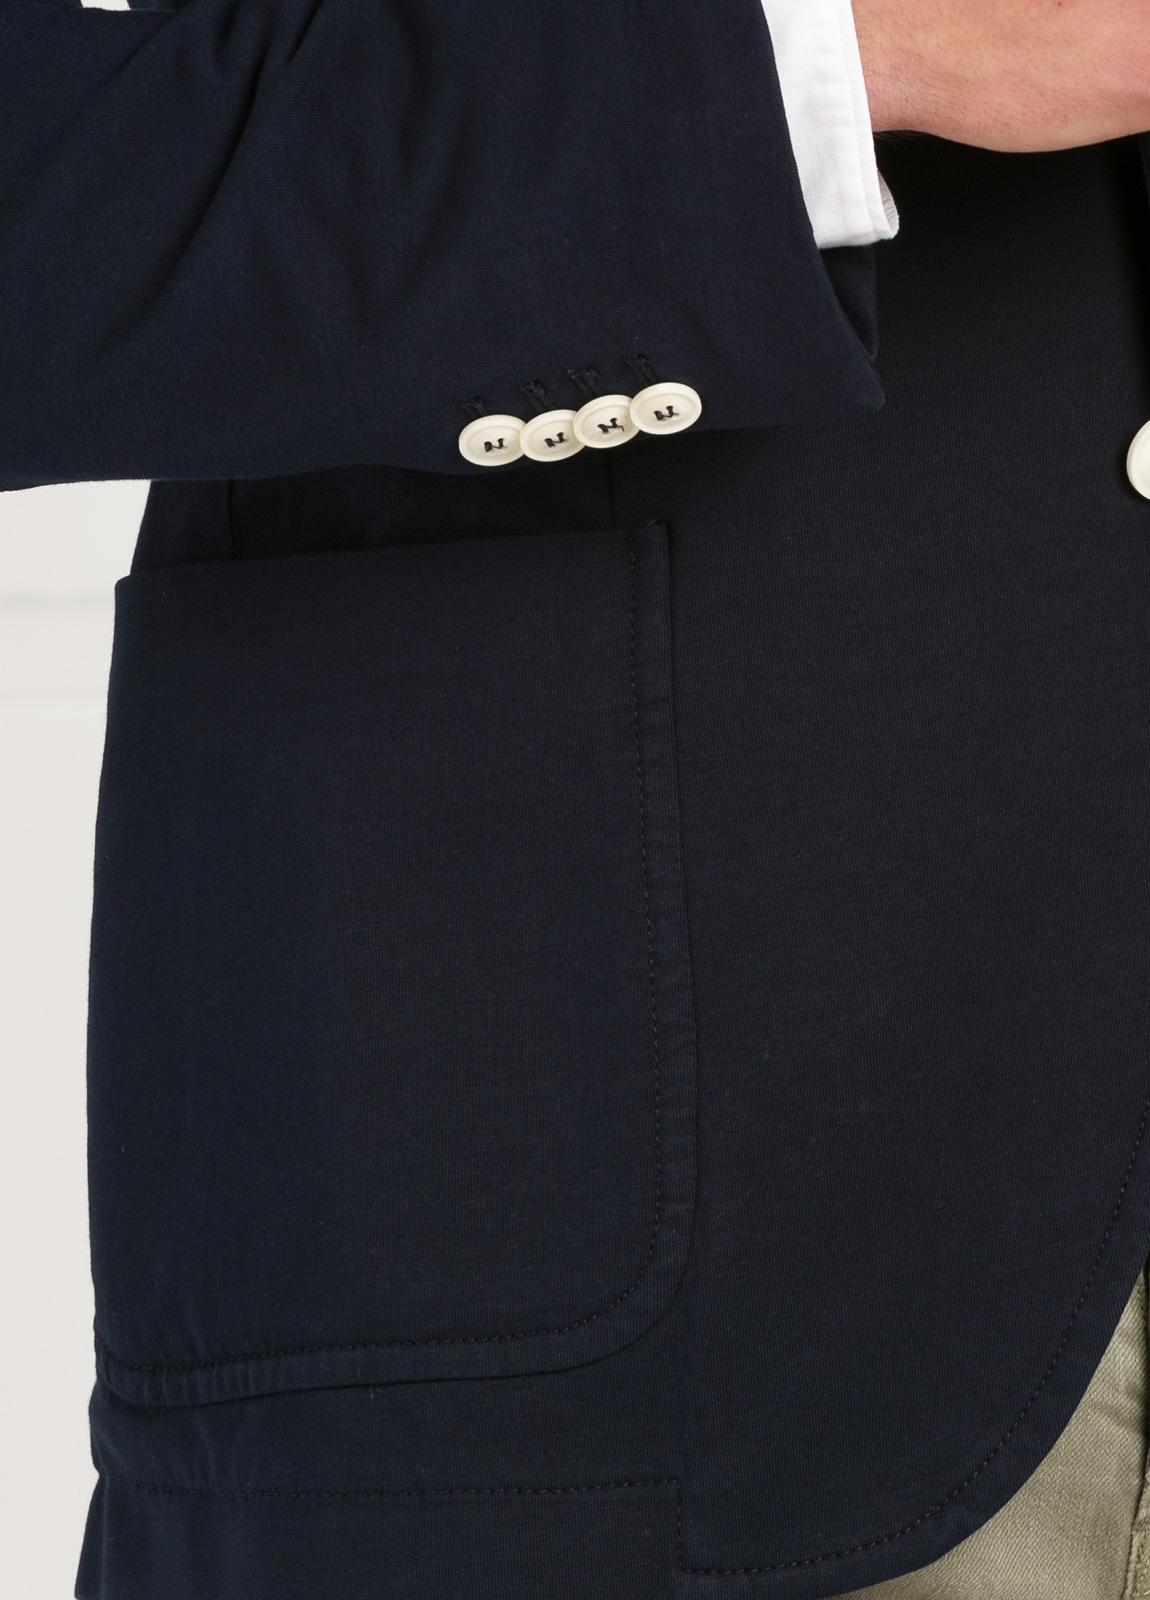 Americana soft 2 botones SLIM FIT liso color azul marino, Algodón. - Ítem1